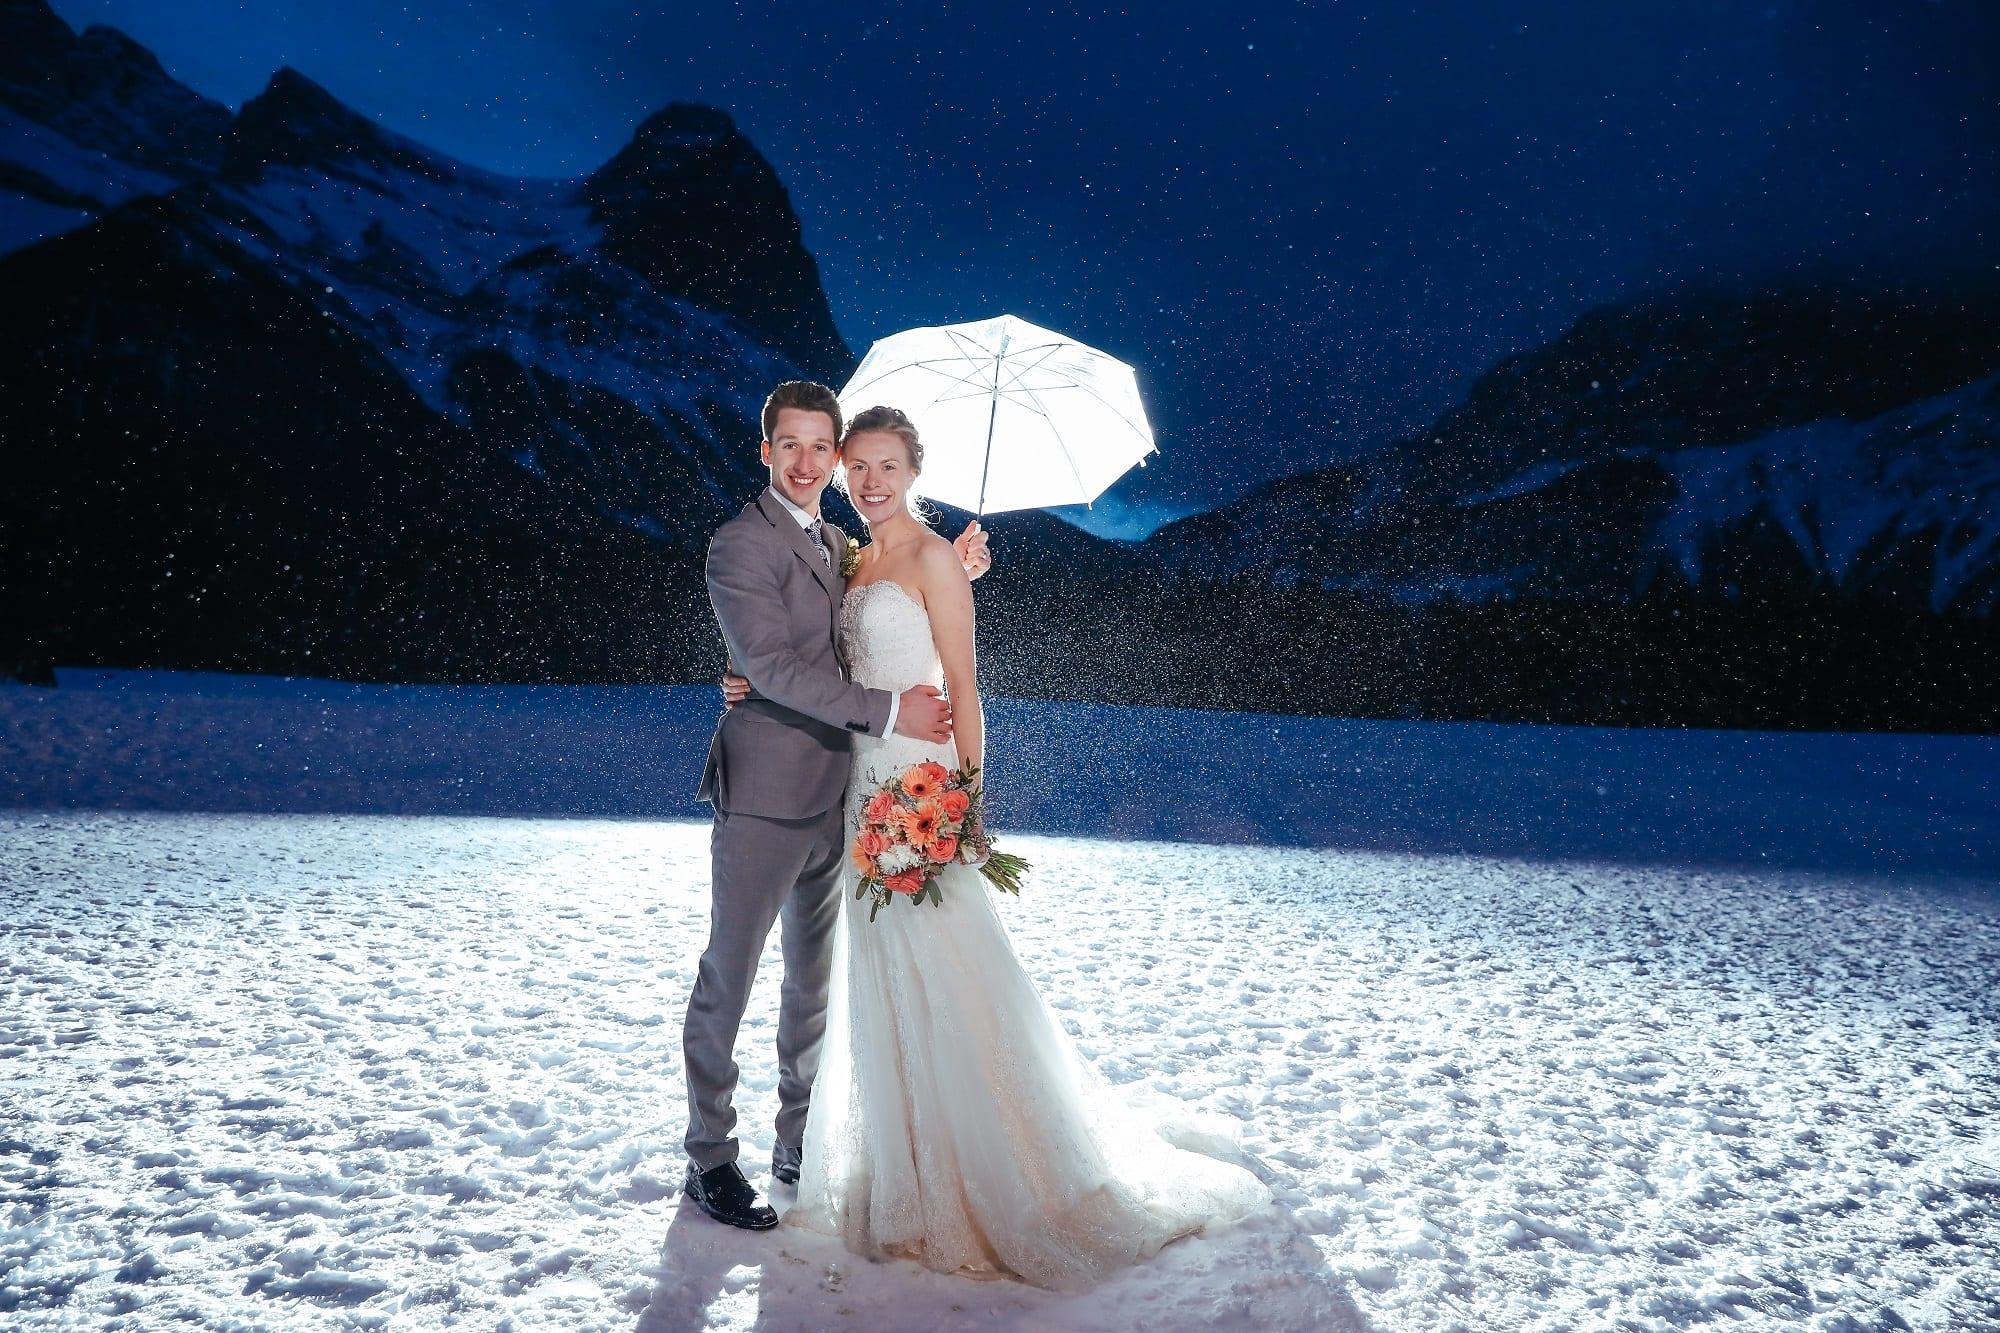 rocky mountain wedding planning